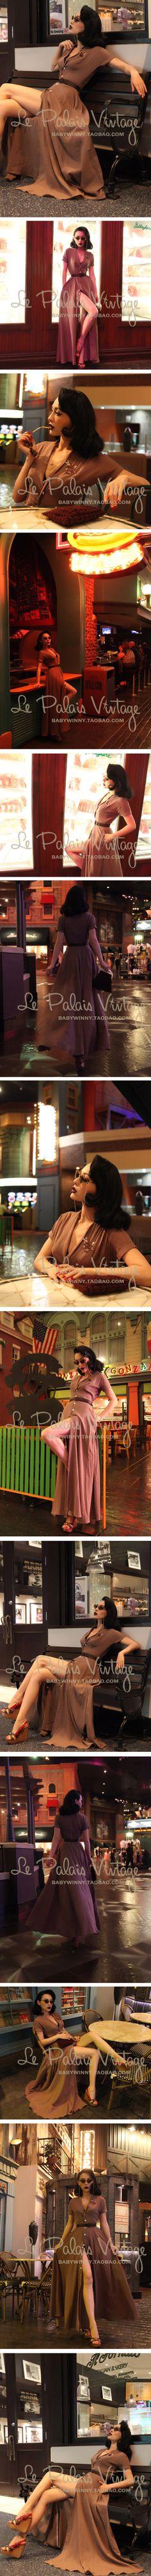 le palais vintage retro classic shirt collar a small elegant oversized swing skirt Slim 0.3-Taobao